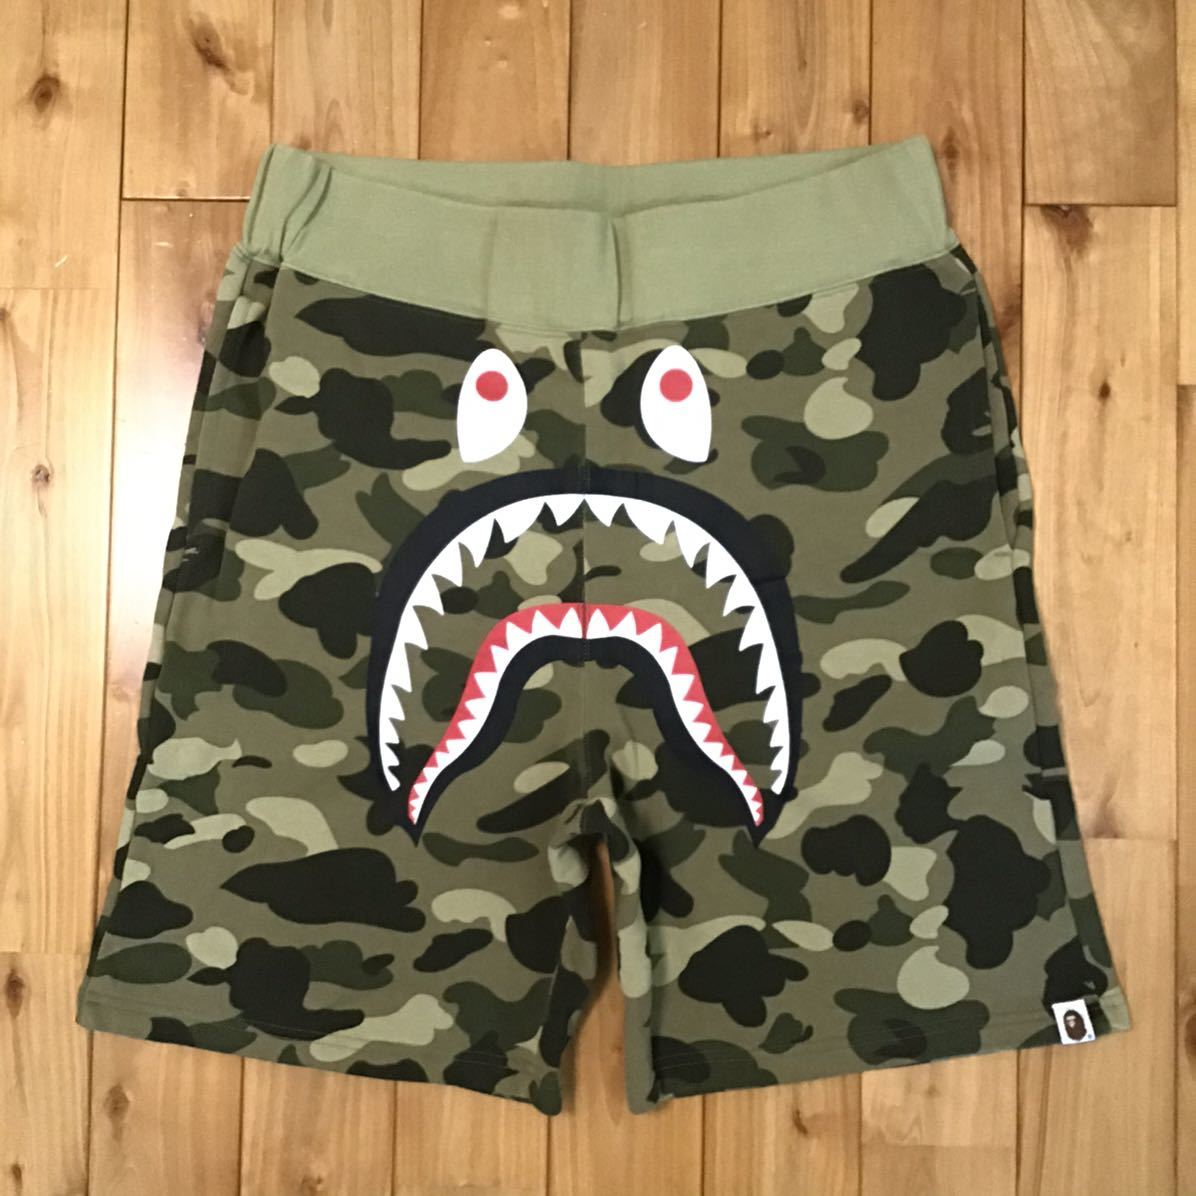 beige camo シャーク ハーフパンツ Lサイズ a bathing ape BAPE shark shorts ショーツ エイプ ベイプ アベイシングエイプ 迷彩 md98